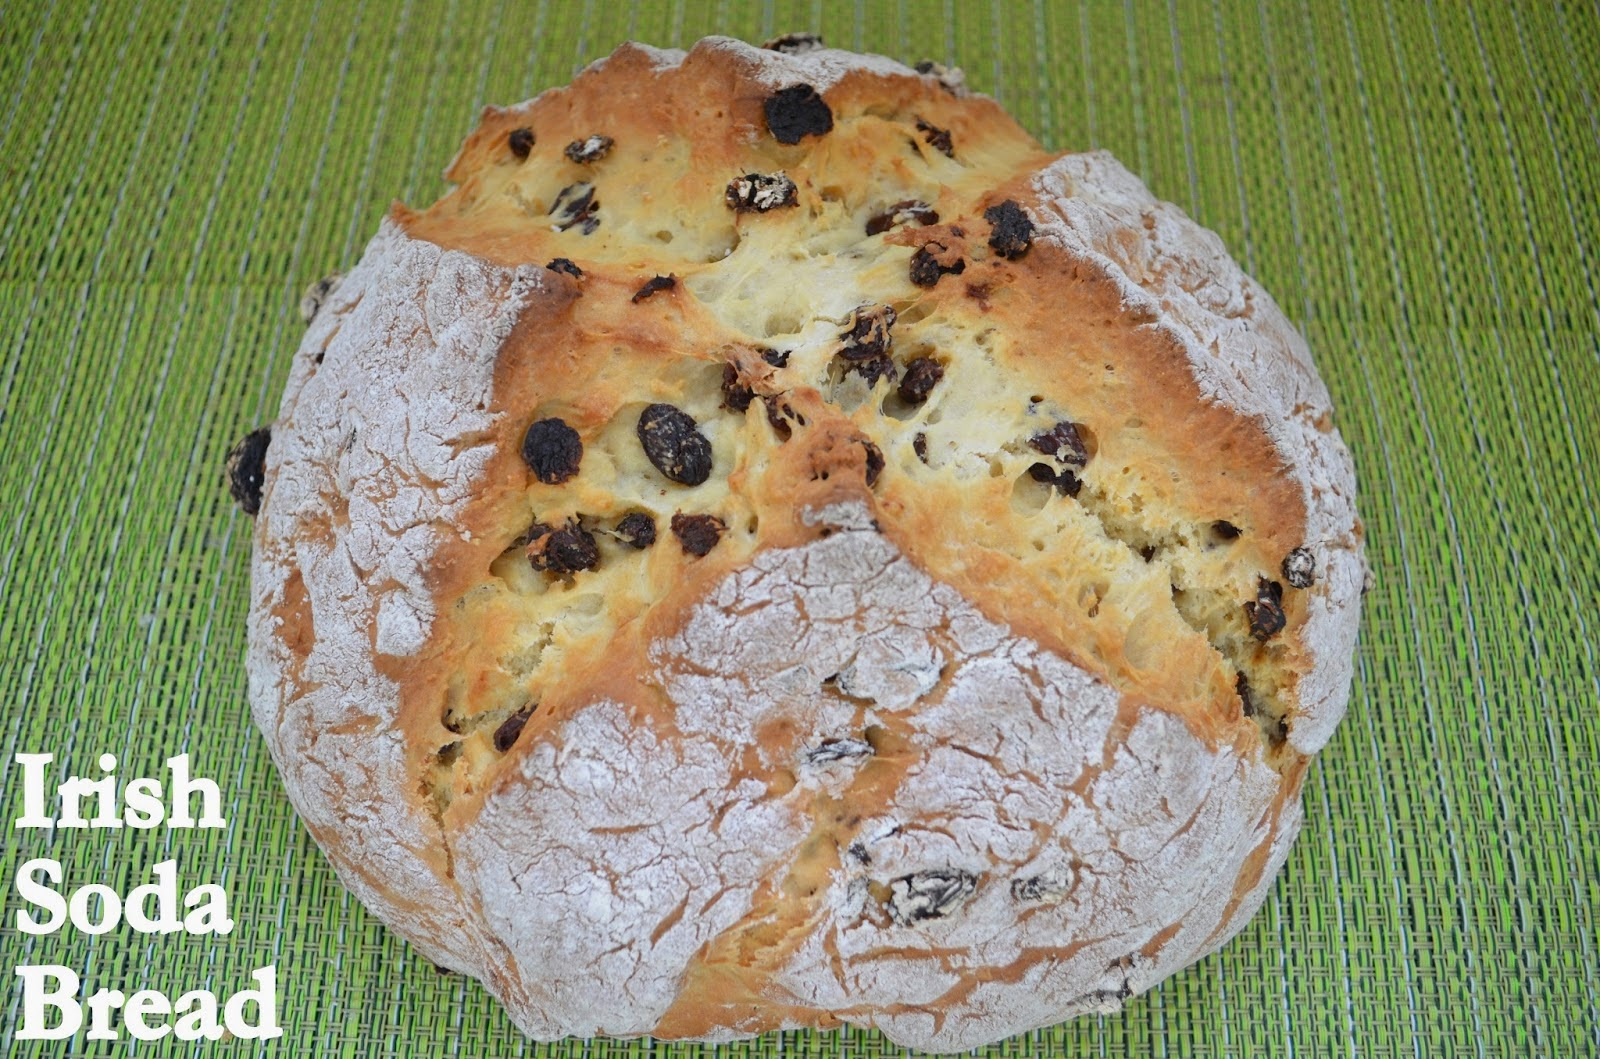 Featured Recipe | Irish Soda Bread from Flavors by Four #bread #Irish #StPatricksDay #SecretRecipeClub #recipe